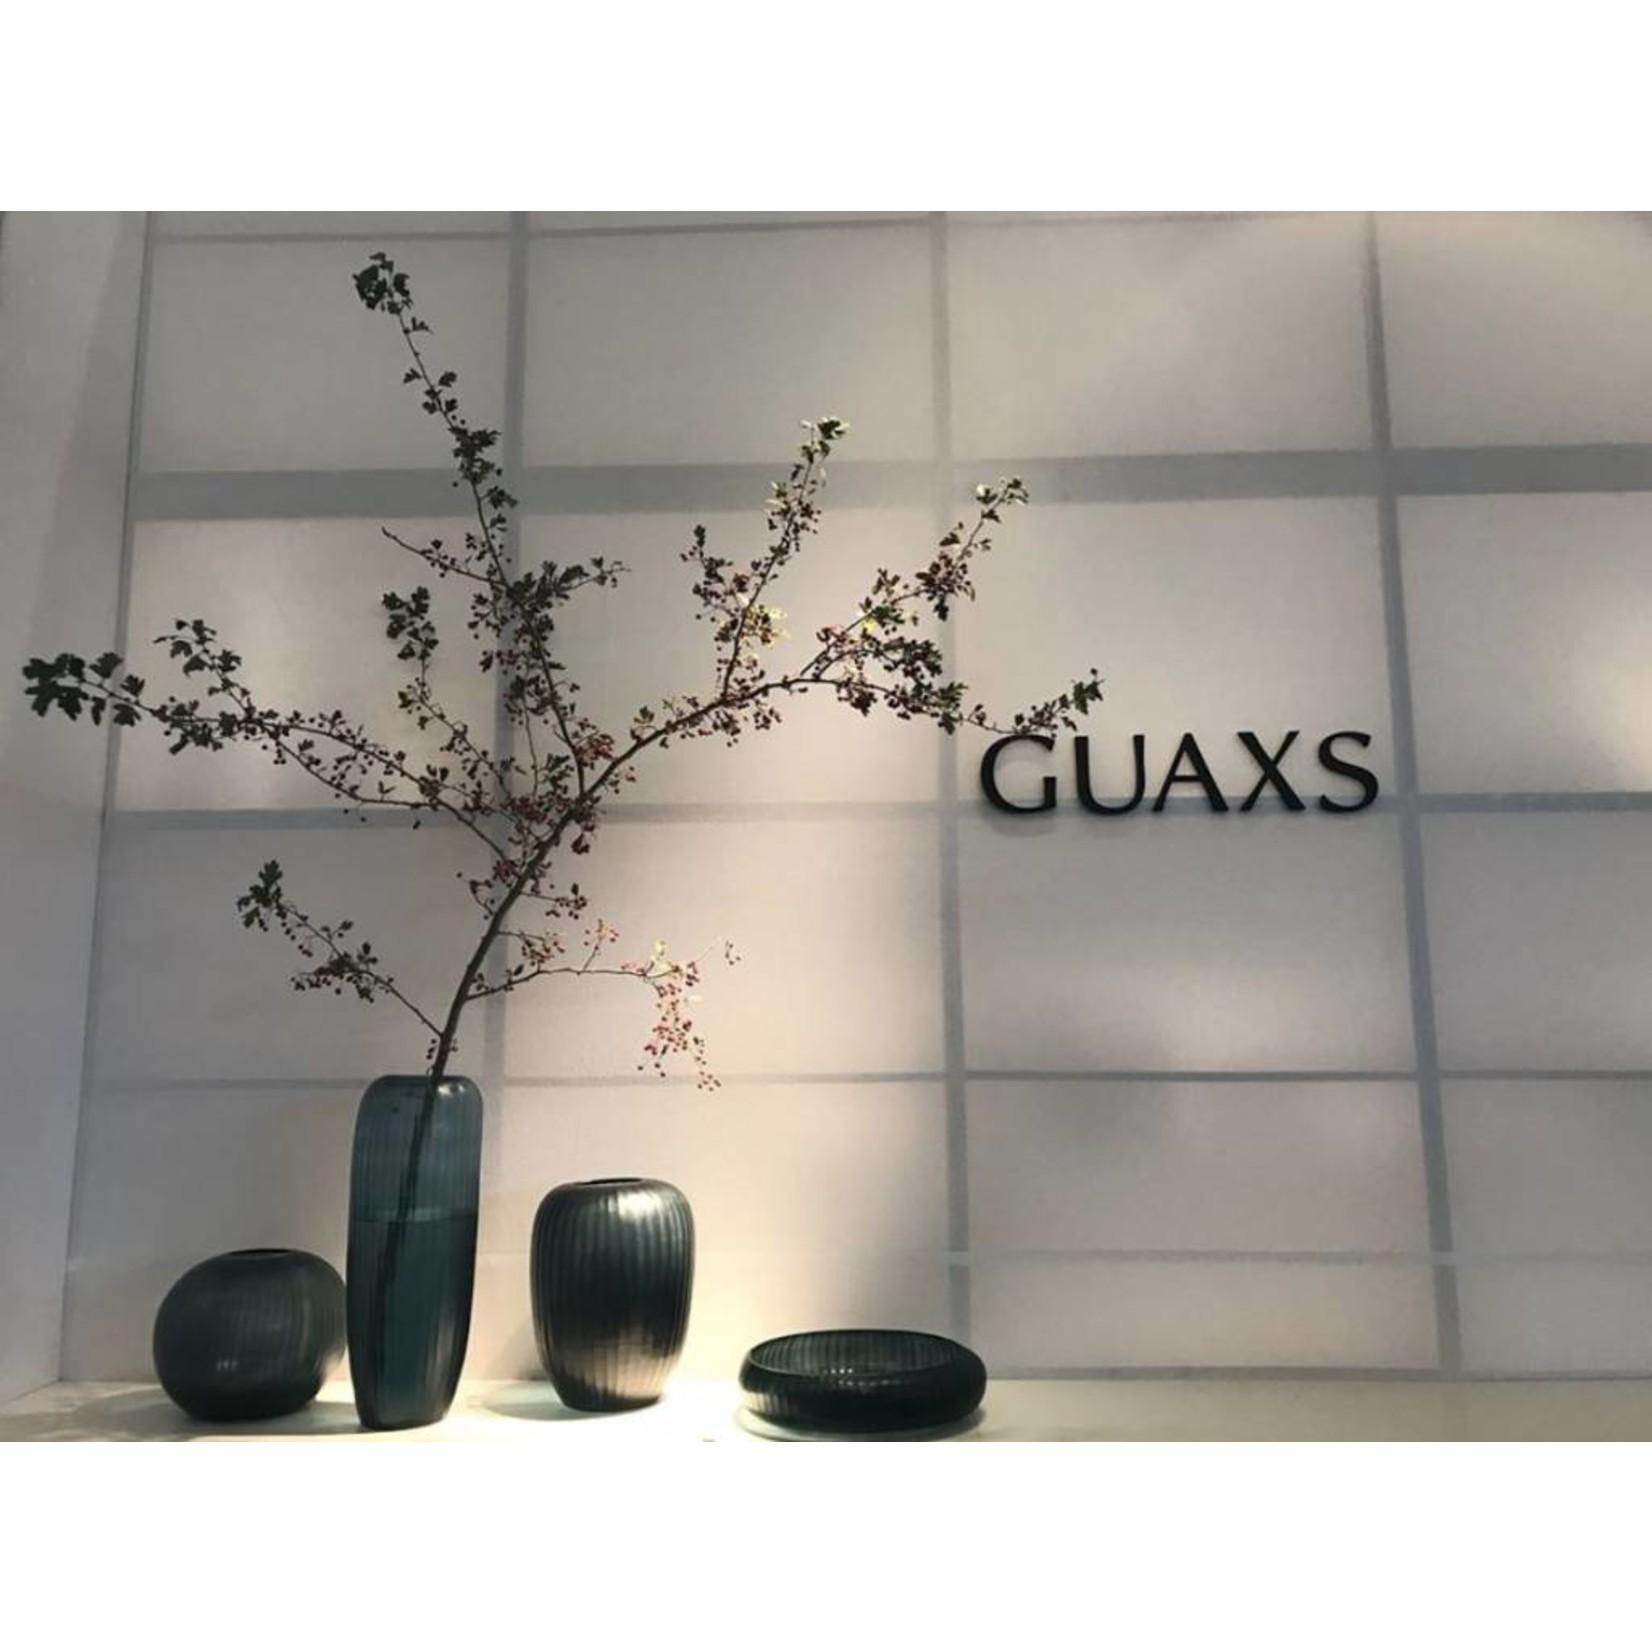 Guaxs Gobi dish   Ocean Blue / Indigo